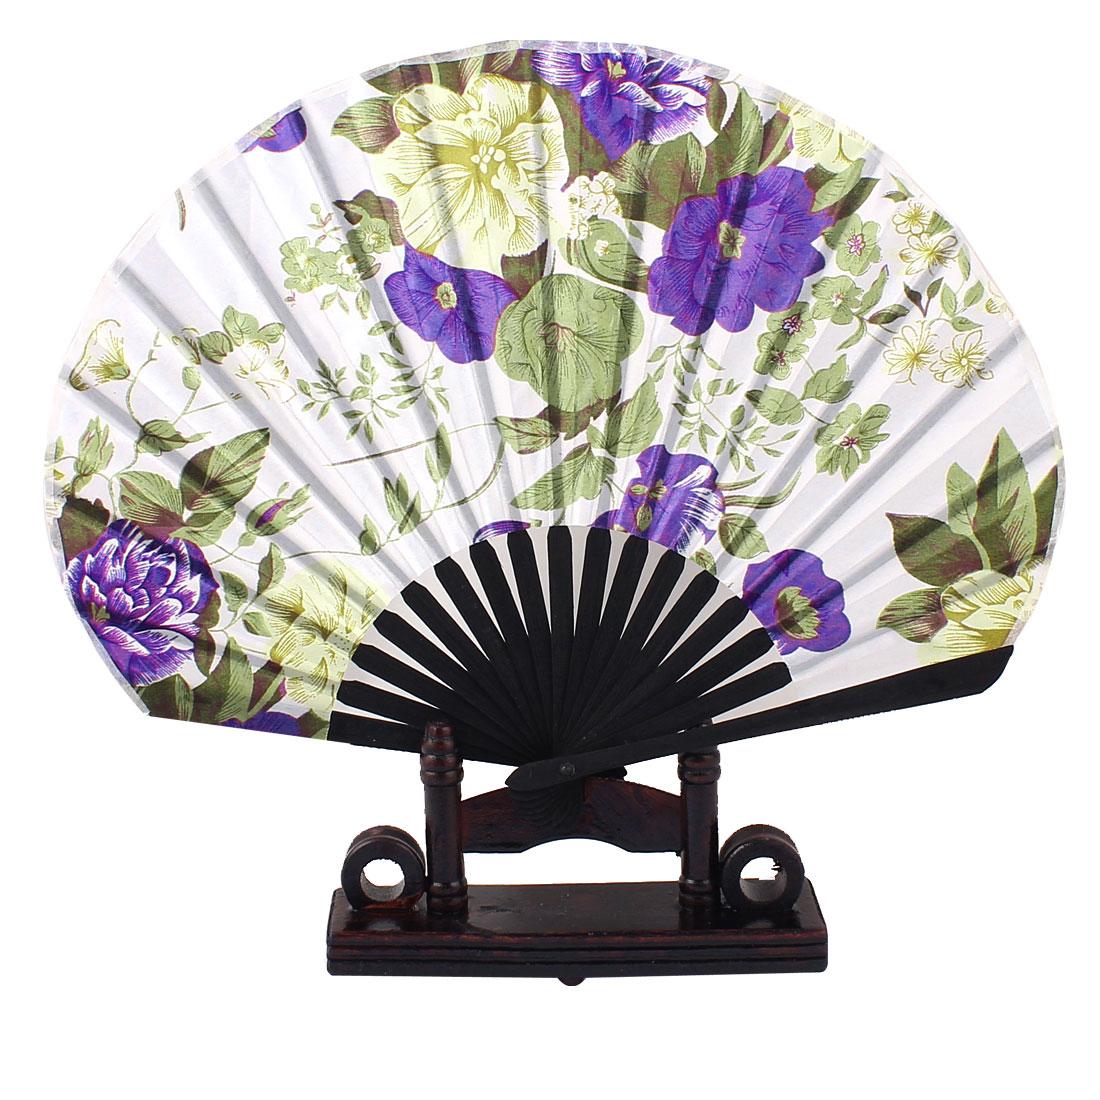 Bamboo Frame Green Leaves Purple Flower Printed White Fabric Cloth Folding Hand Fan w Holder